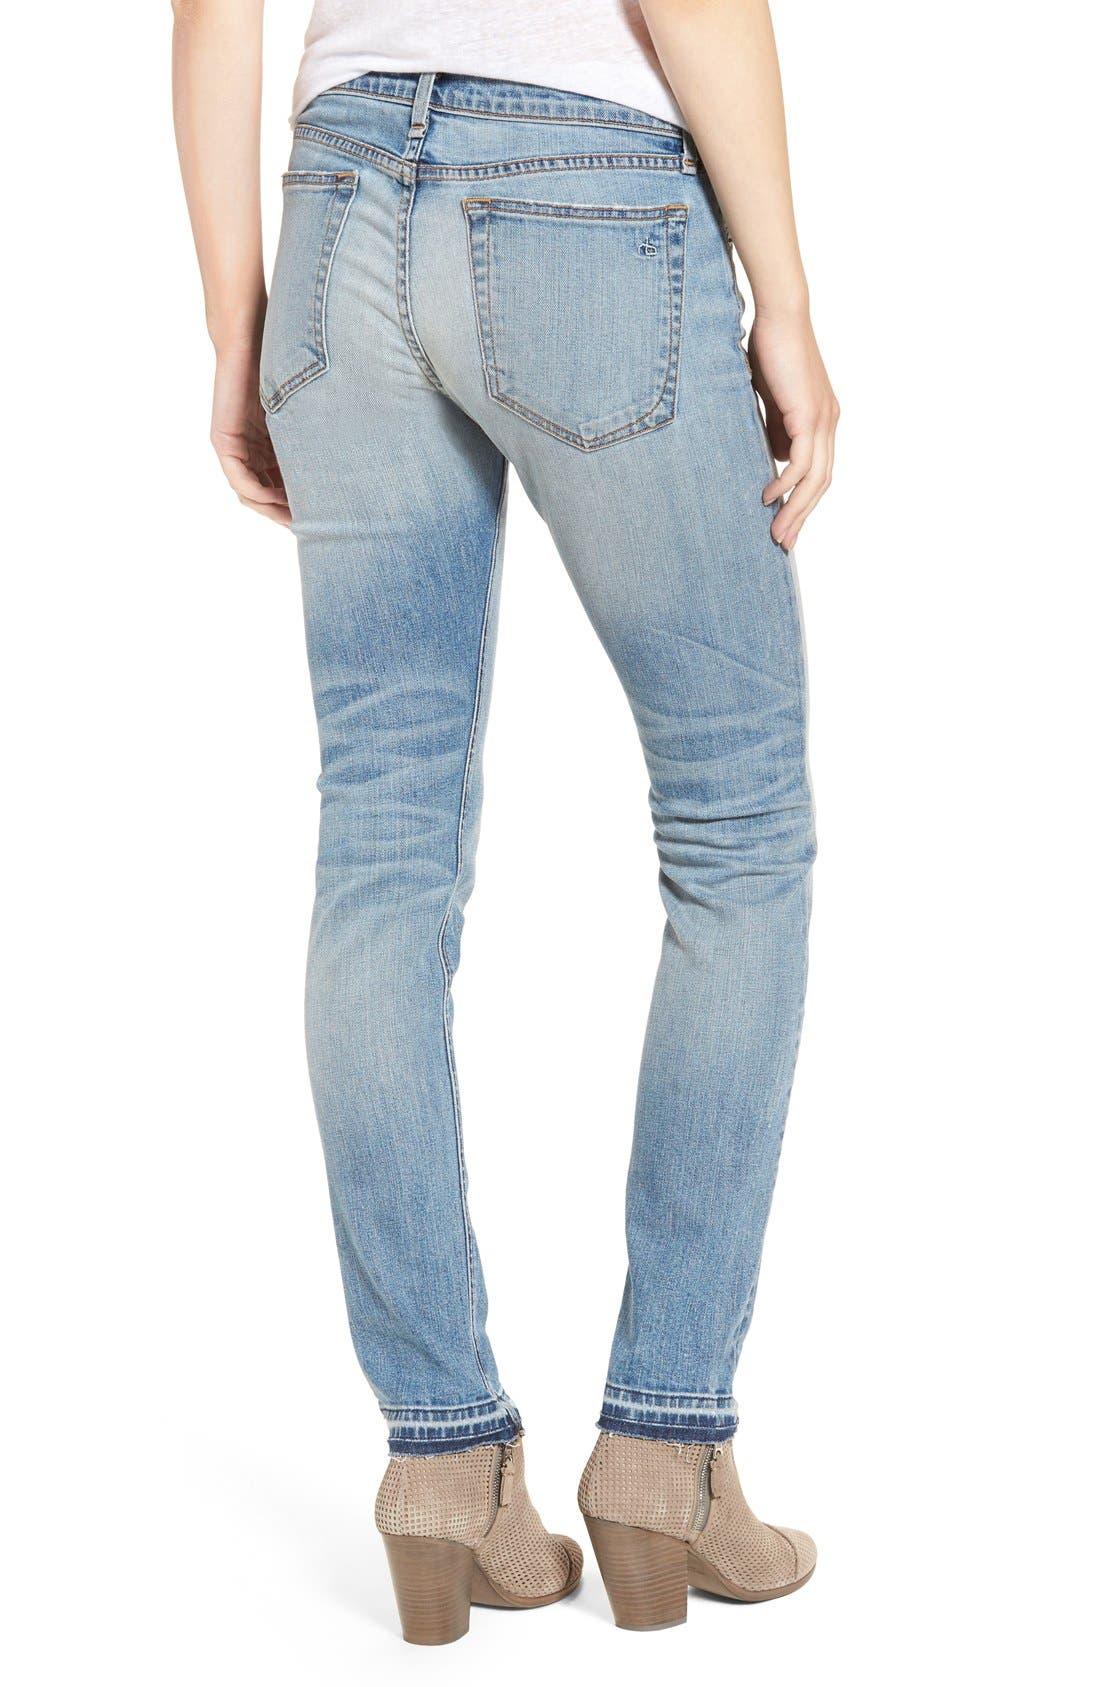 Alternate Image 2  - rag & bone/JEAN 'The Dre' Slim Boyfriend Jeans